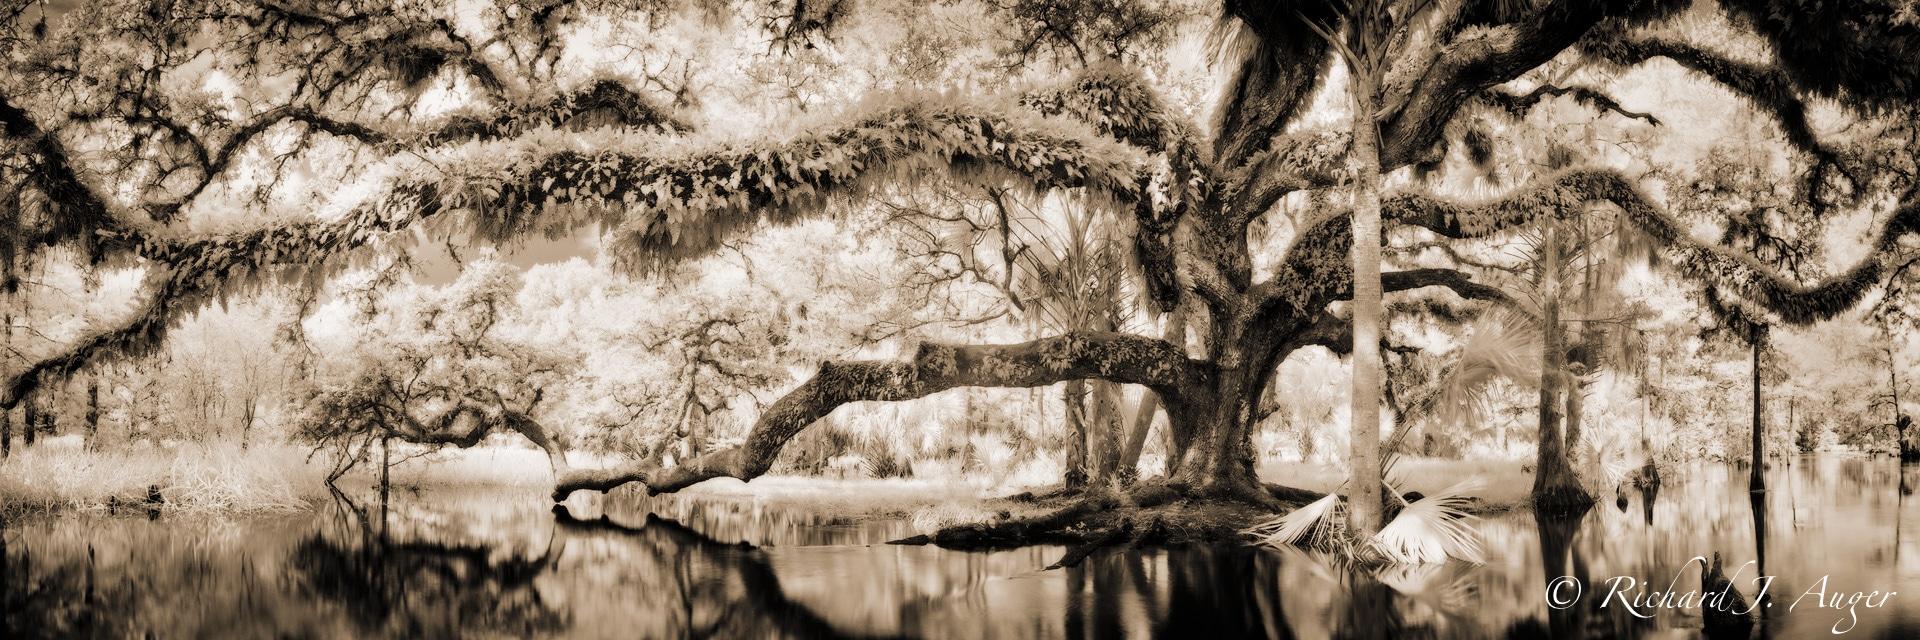 Fisheating Creek, Florida, Oak Tree, Water, Swamp, haunted, sepia, monochrome, landscape, photographer, sepia tone, black and white, panorama